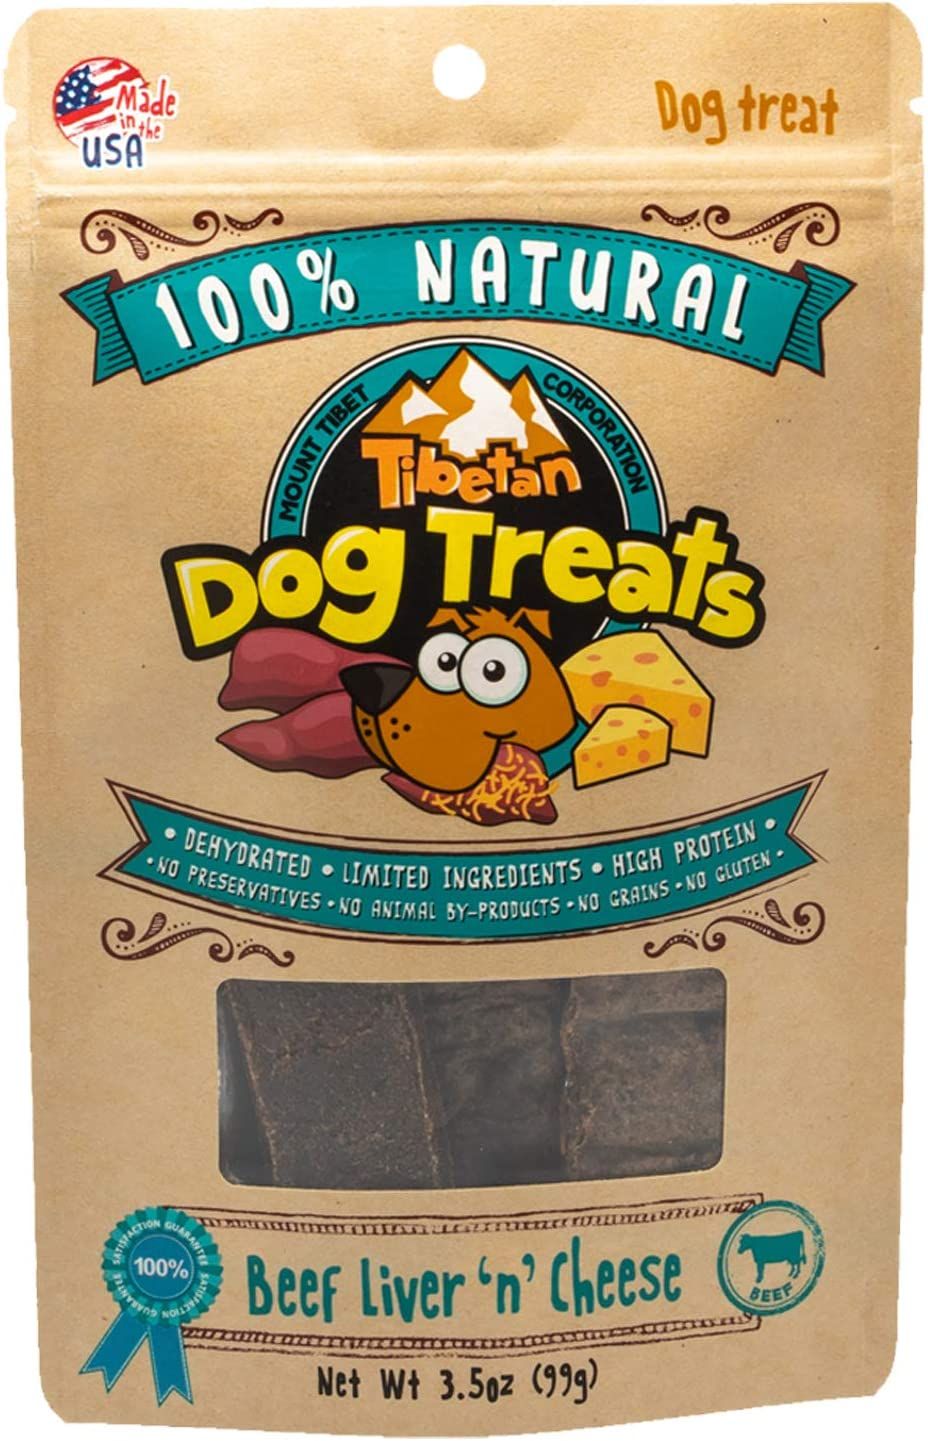 Tibetan Yak Cheese Dog Treats – Beef Liver 'n' Cheese, 3.5oz, Made in USA, 100% Natural, High Protein, NO Preservatives, NO Additives, NO Grains, NO Gluten, NO Corn, NO Soy